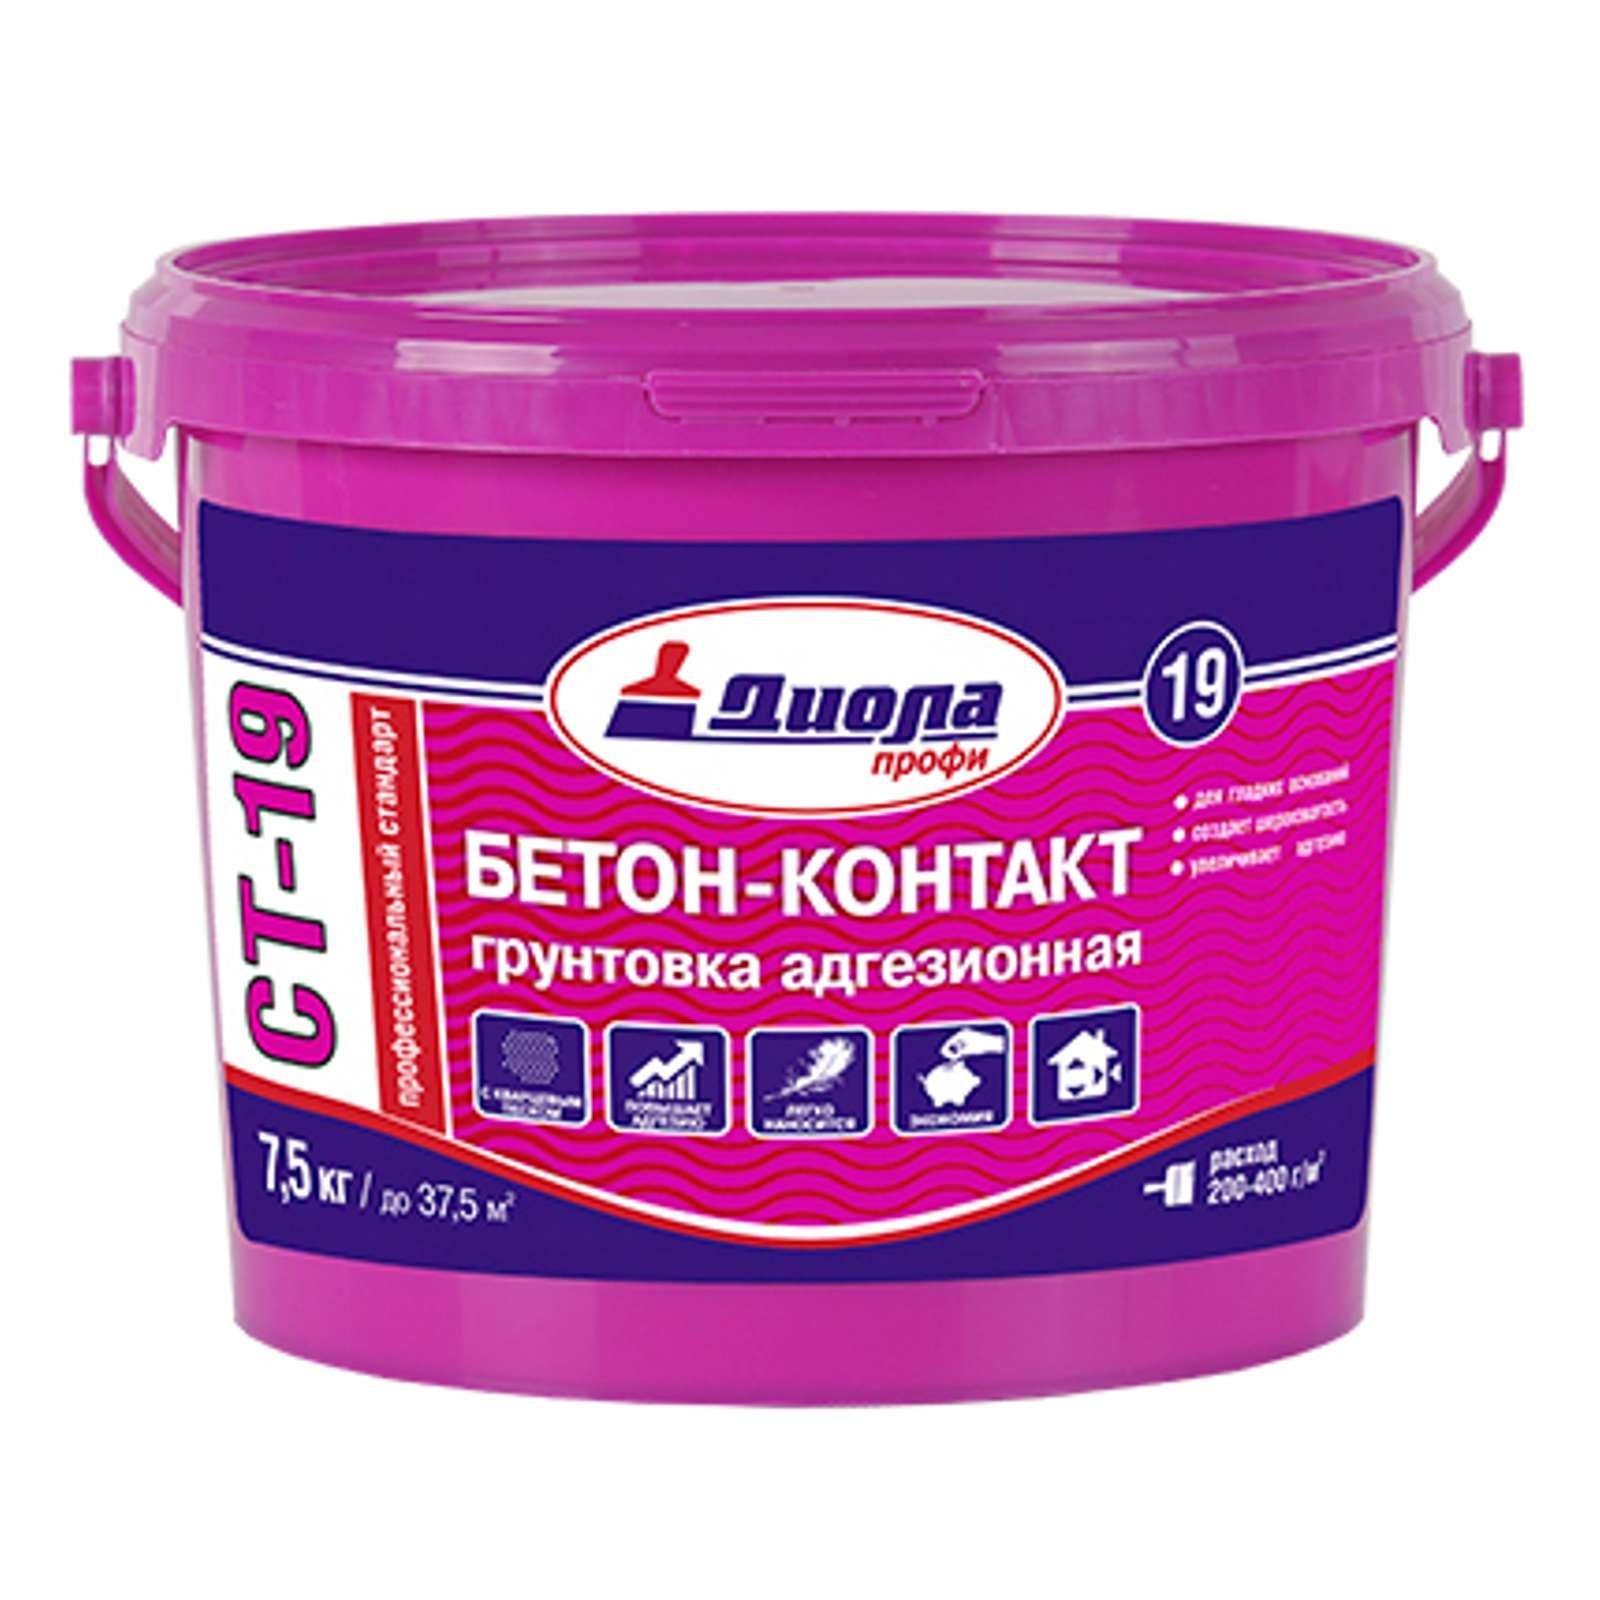 Грунт Бетон Контакт Диола ПРОФ СТ-19, 7,5 кг (евроведро)